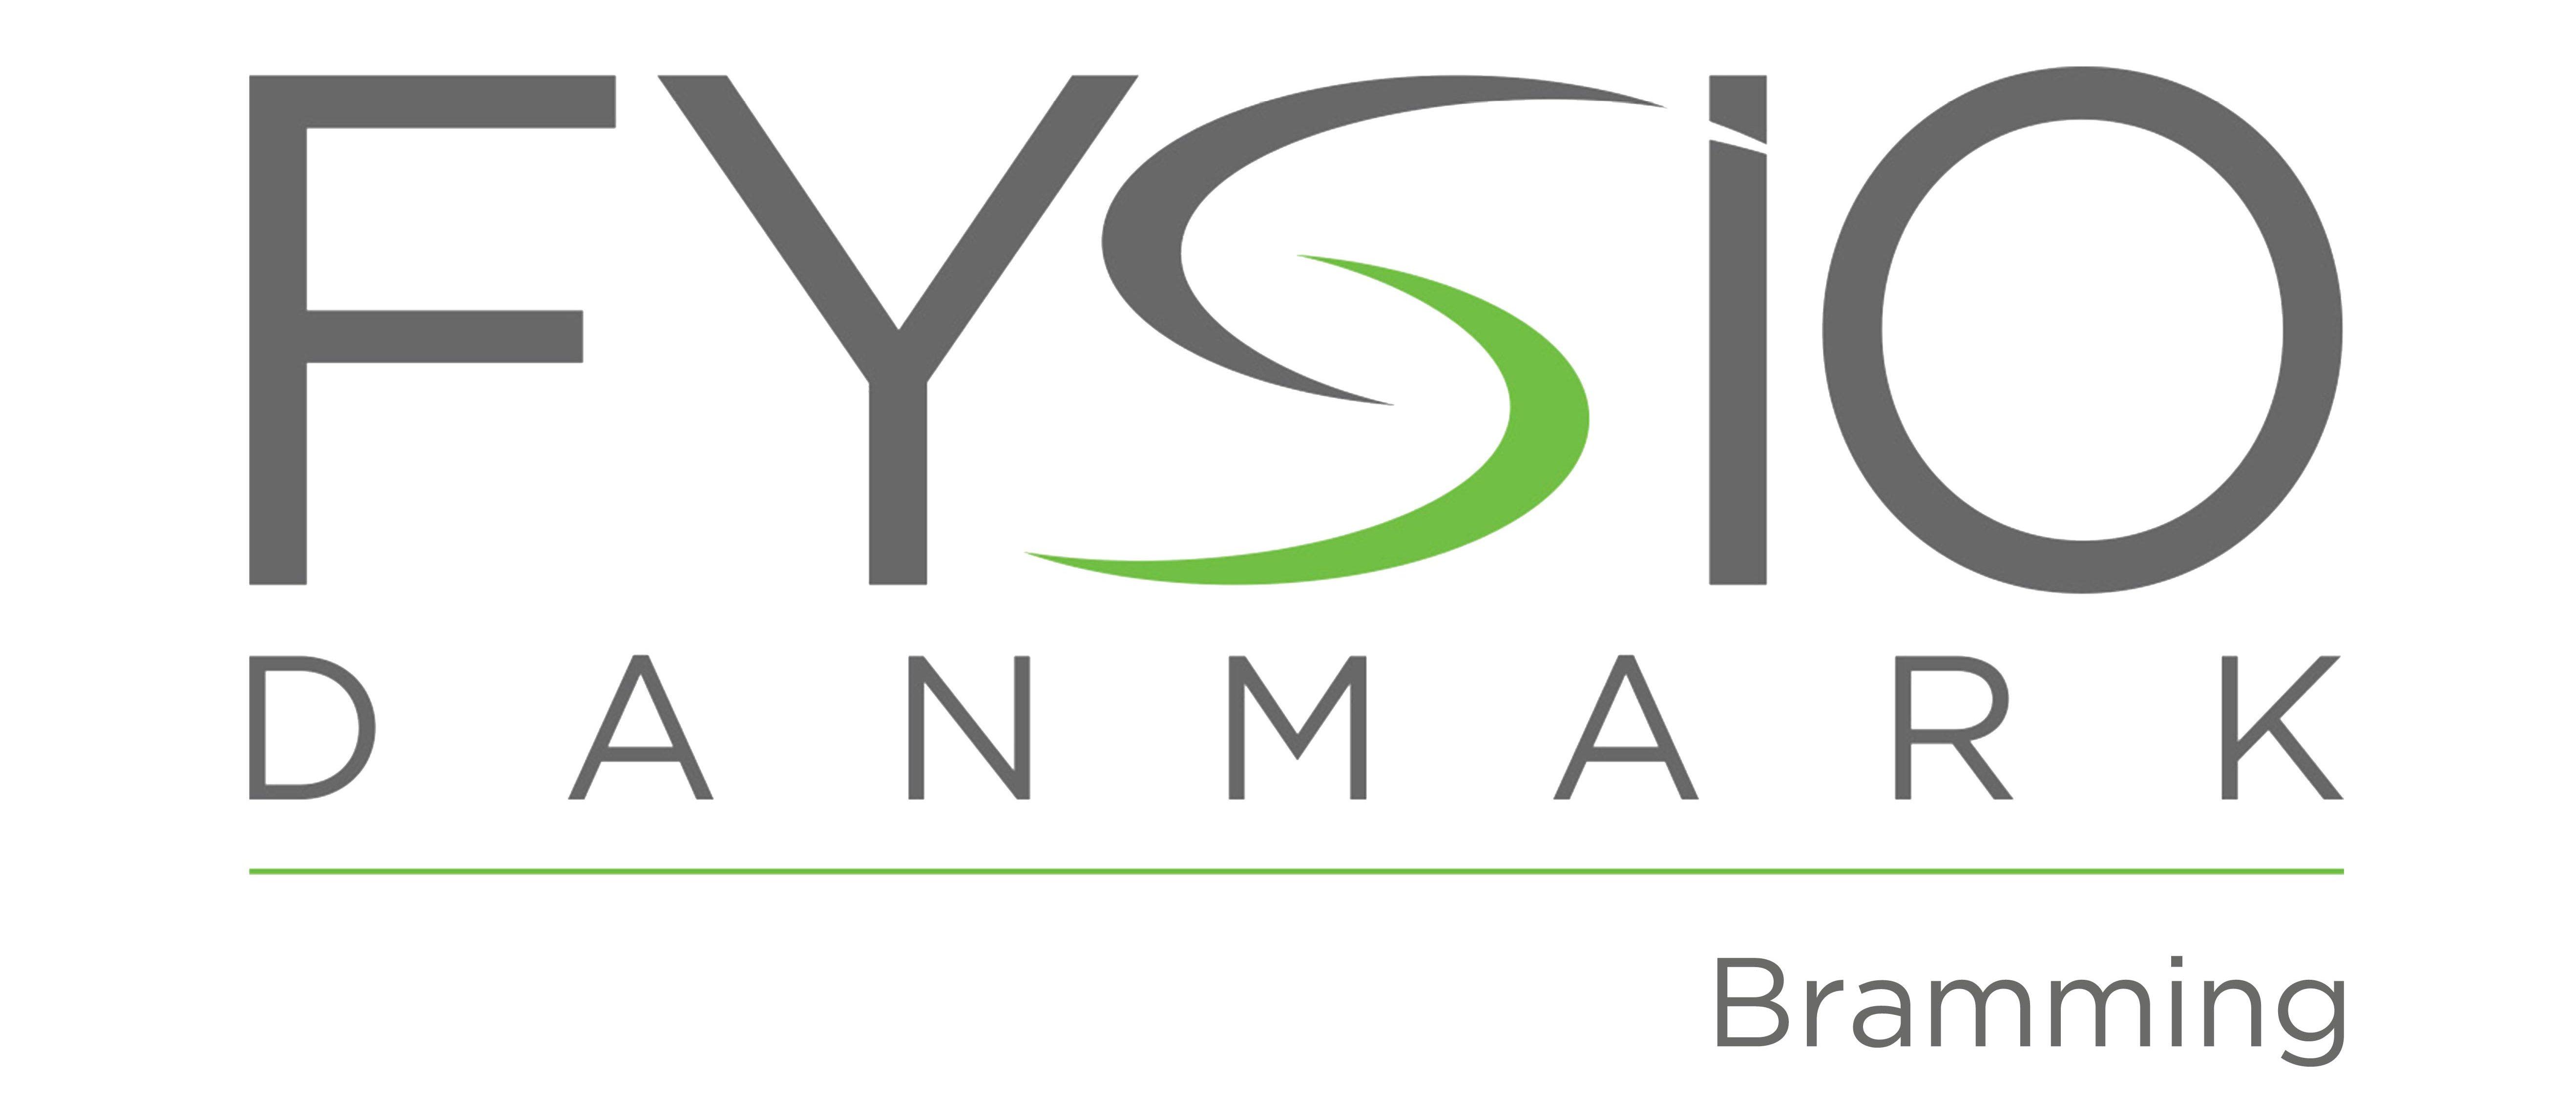 FysioDanmark – Bramming | Din lokale Fysioterapeut